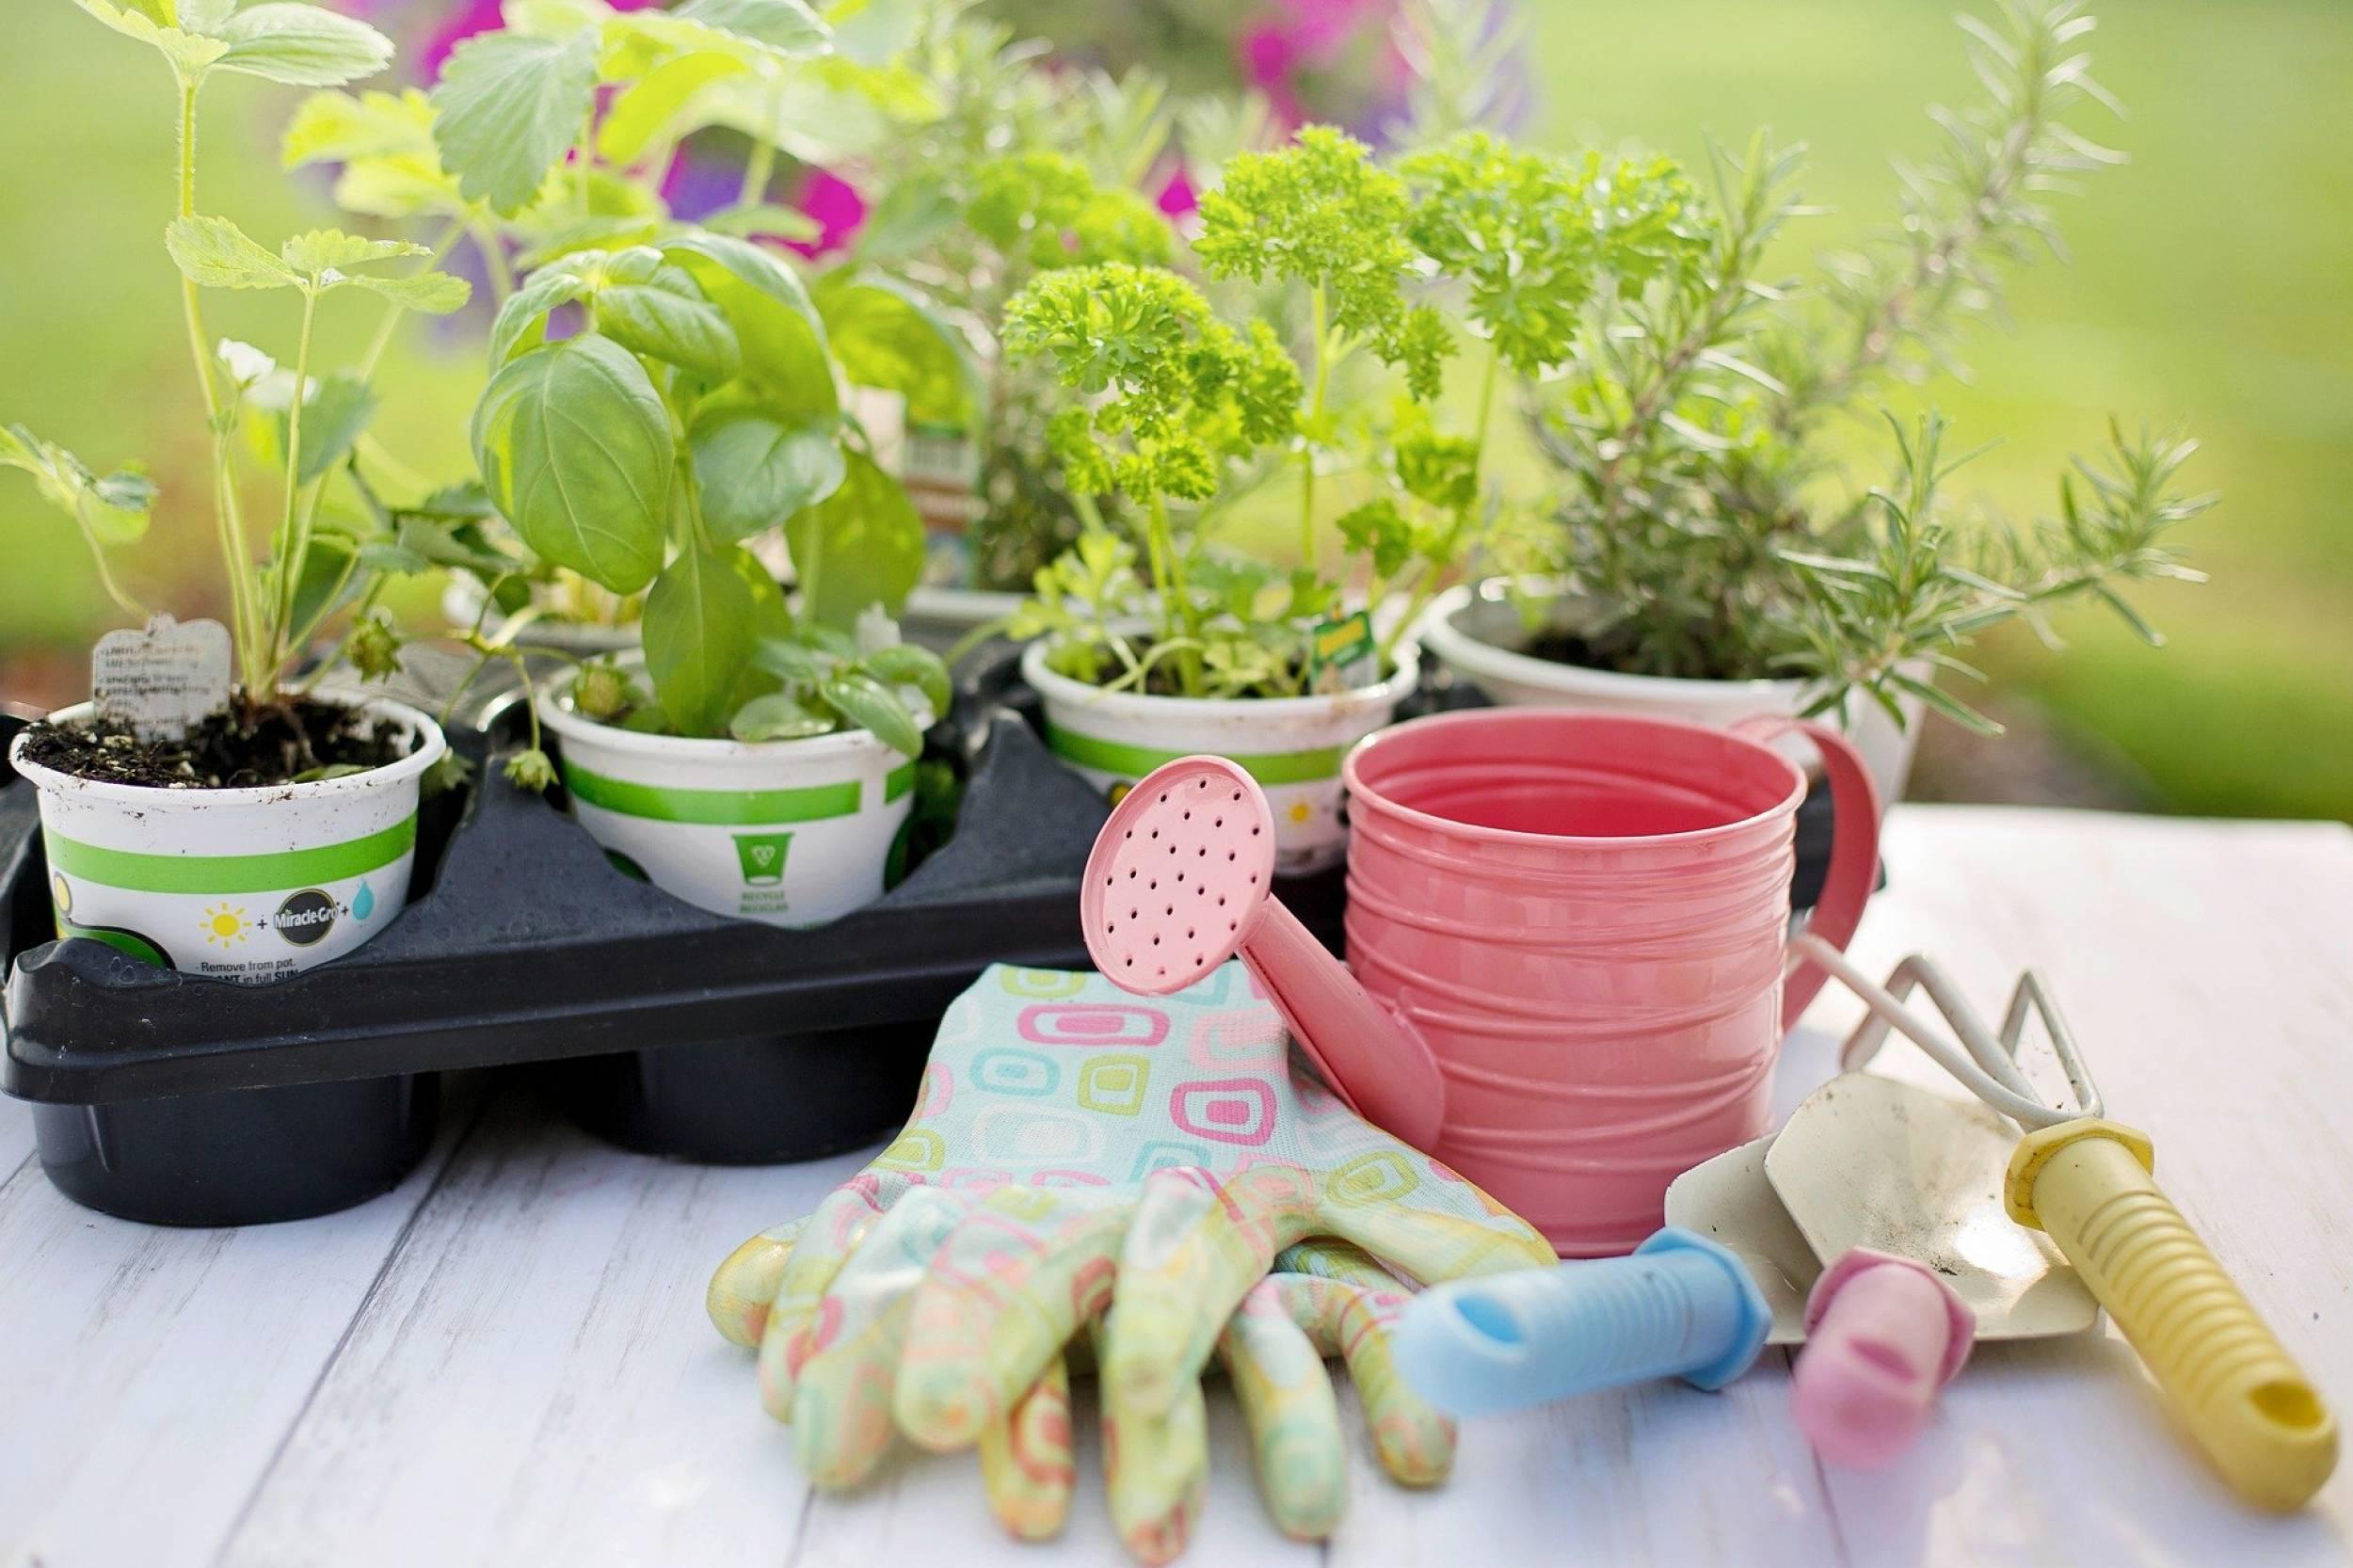 planting-4226838_1920